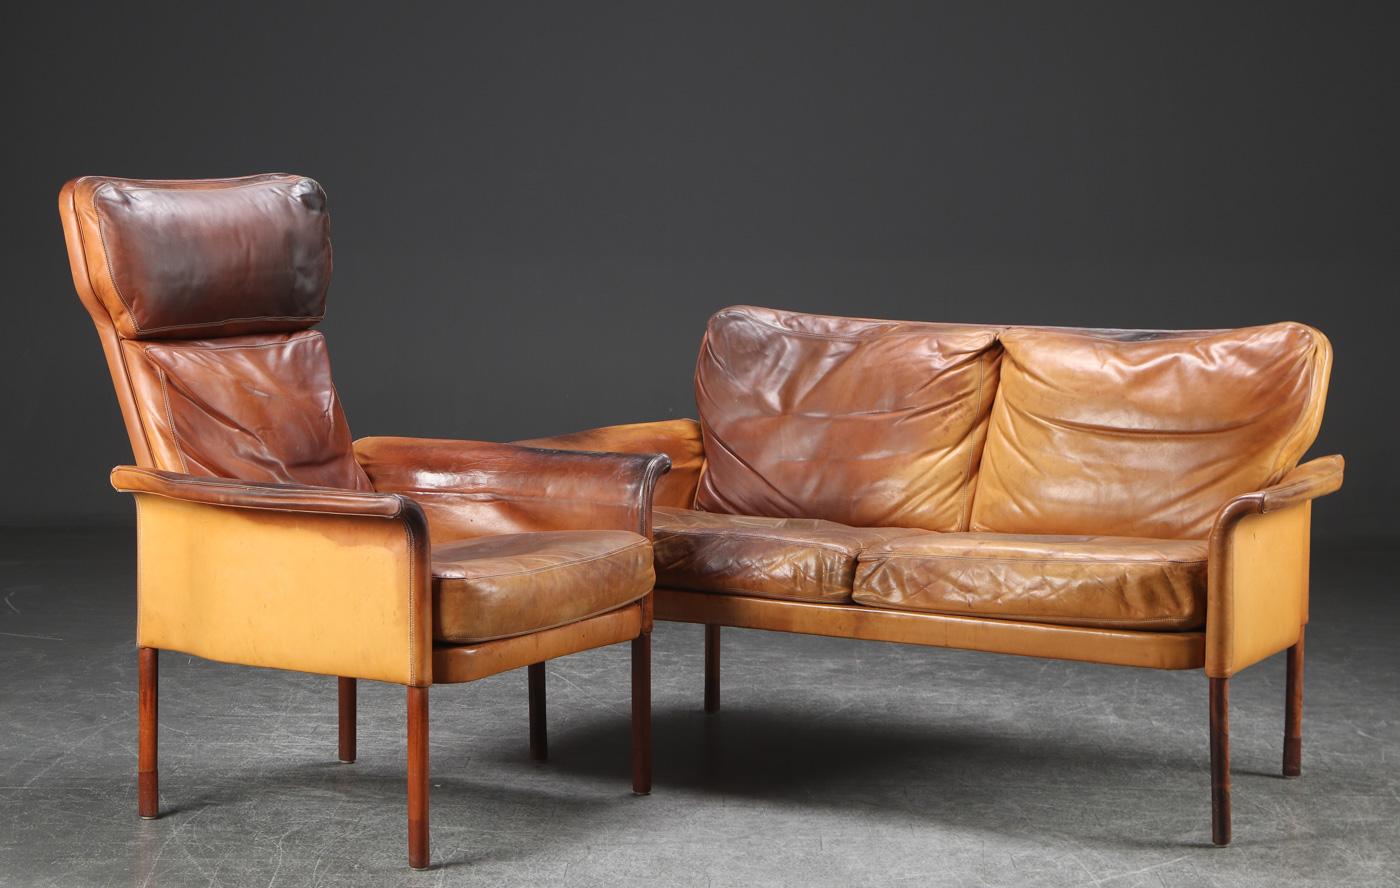 sofa samt interesting promemoria sofa dolce vita leder samt in dreieich with sofa samt good. Black Bedroom Furniture Sets. Home Design Ideas